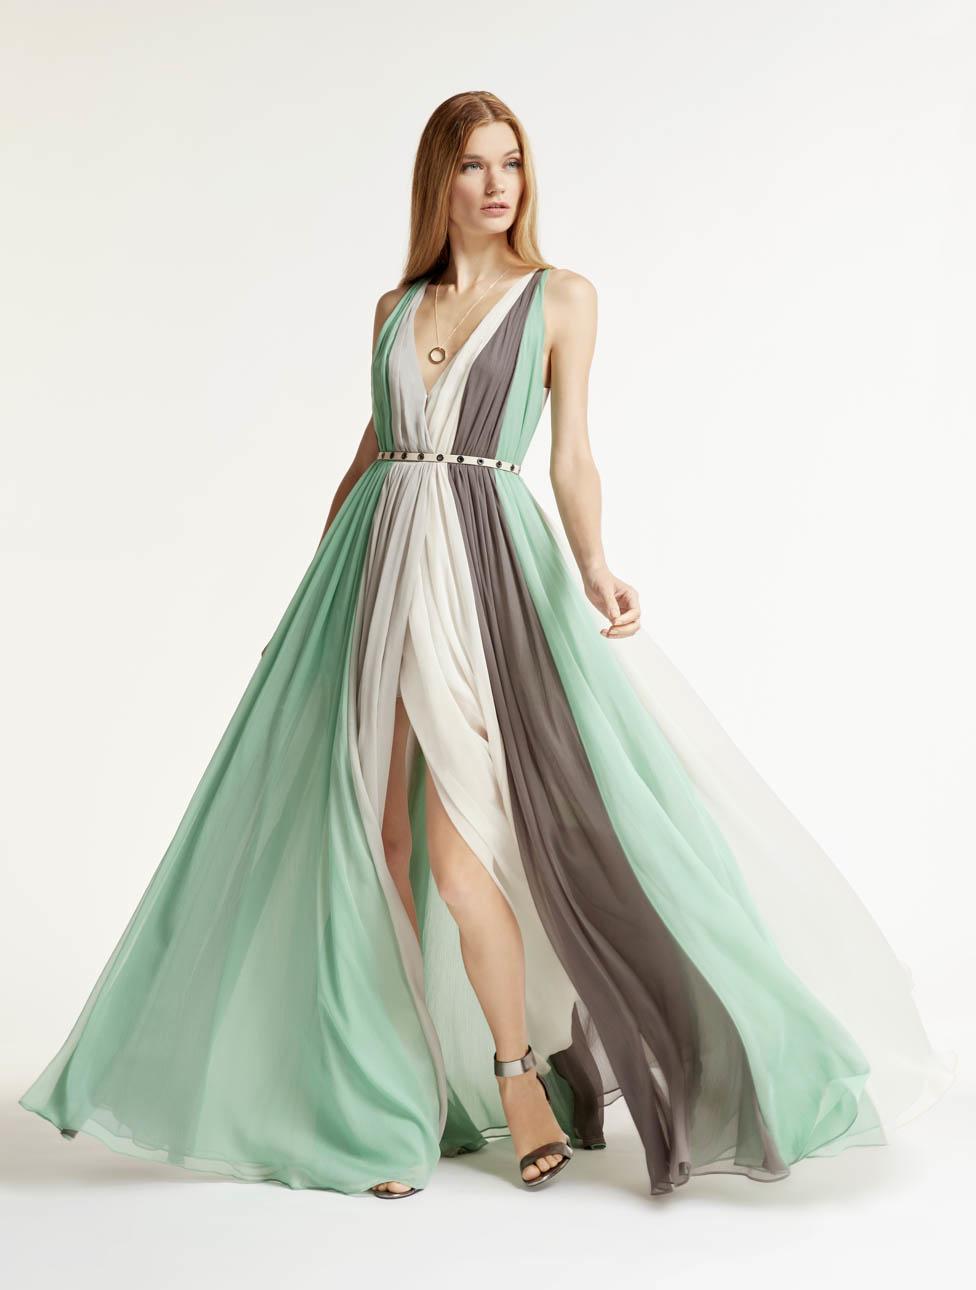 Lyst - Halston Multi Color Chiffon Gown